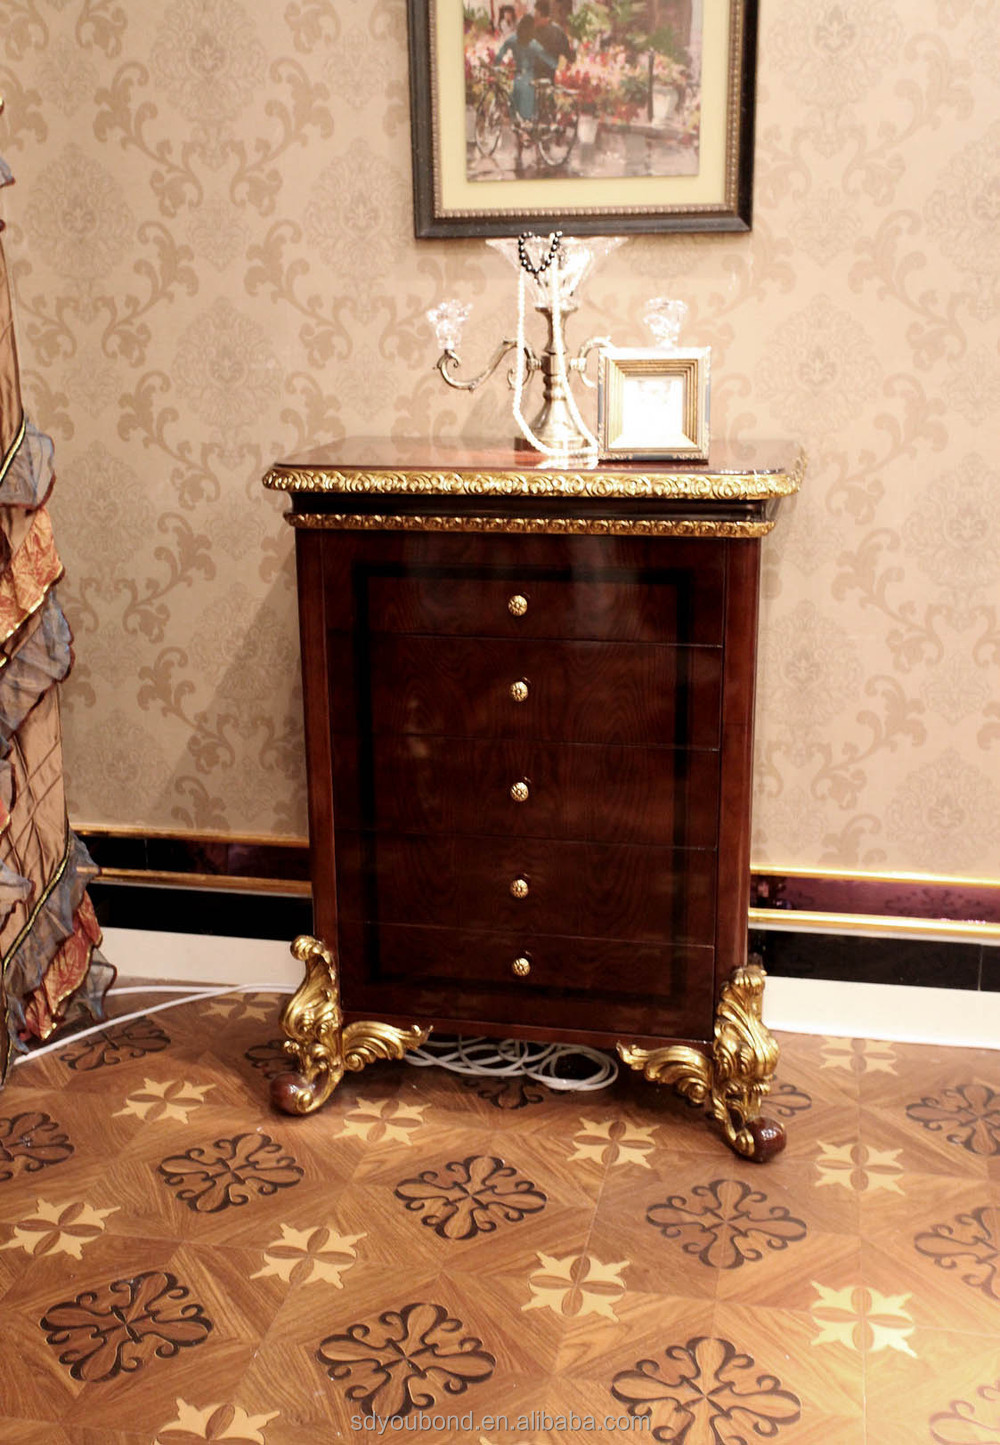 Luxury Bedroom Sets Furniture 0063 Luxury Home Bedroom Sets Furniture Classic Wooden Bed View